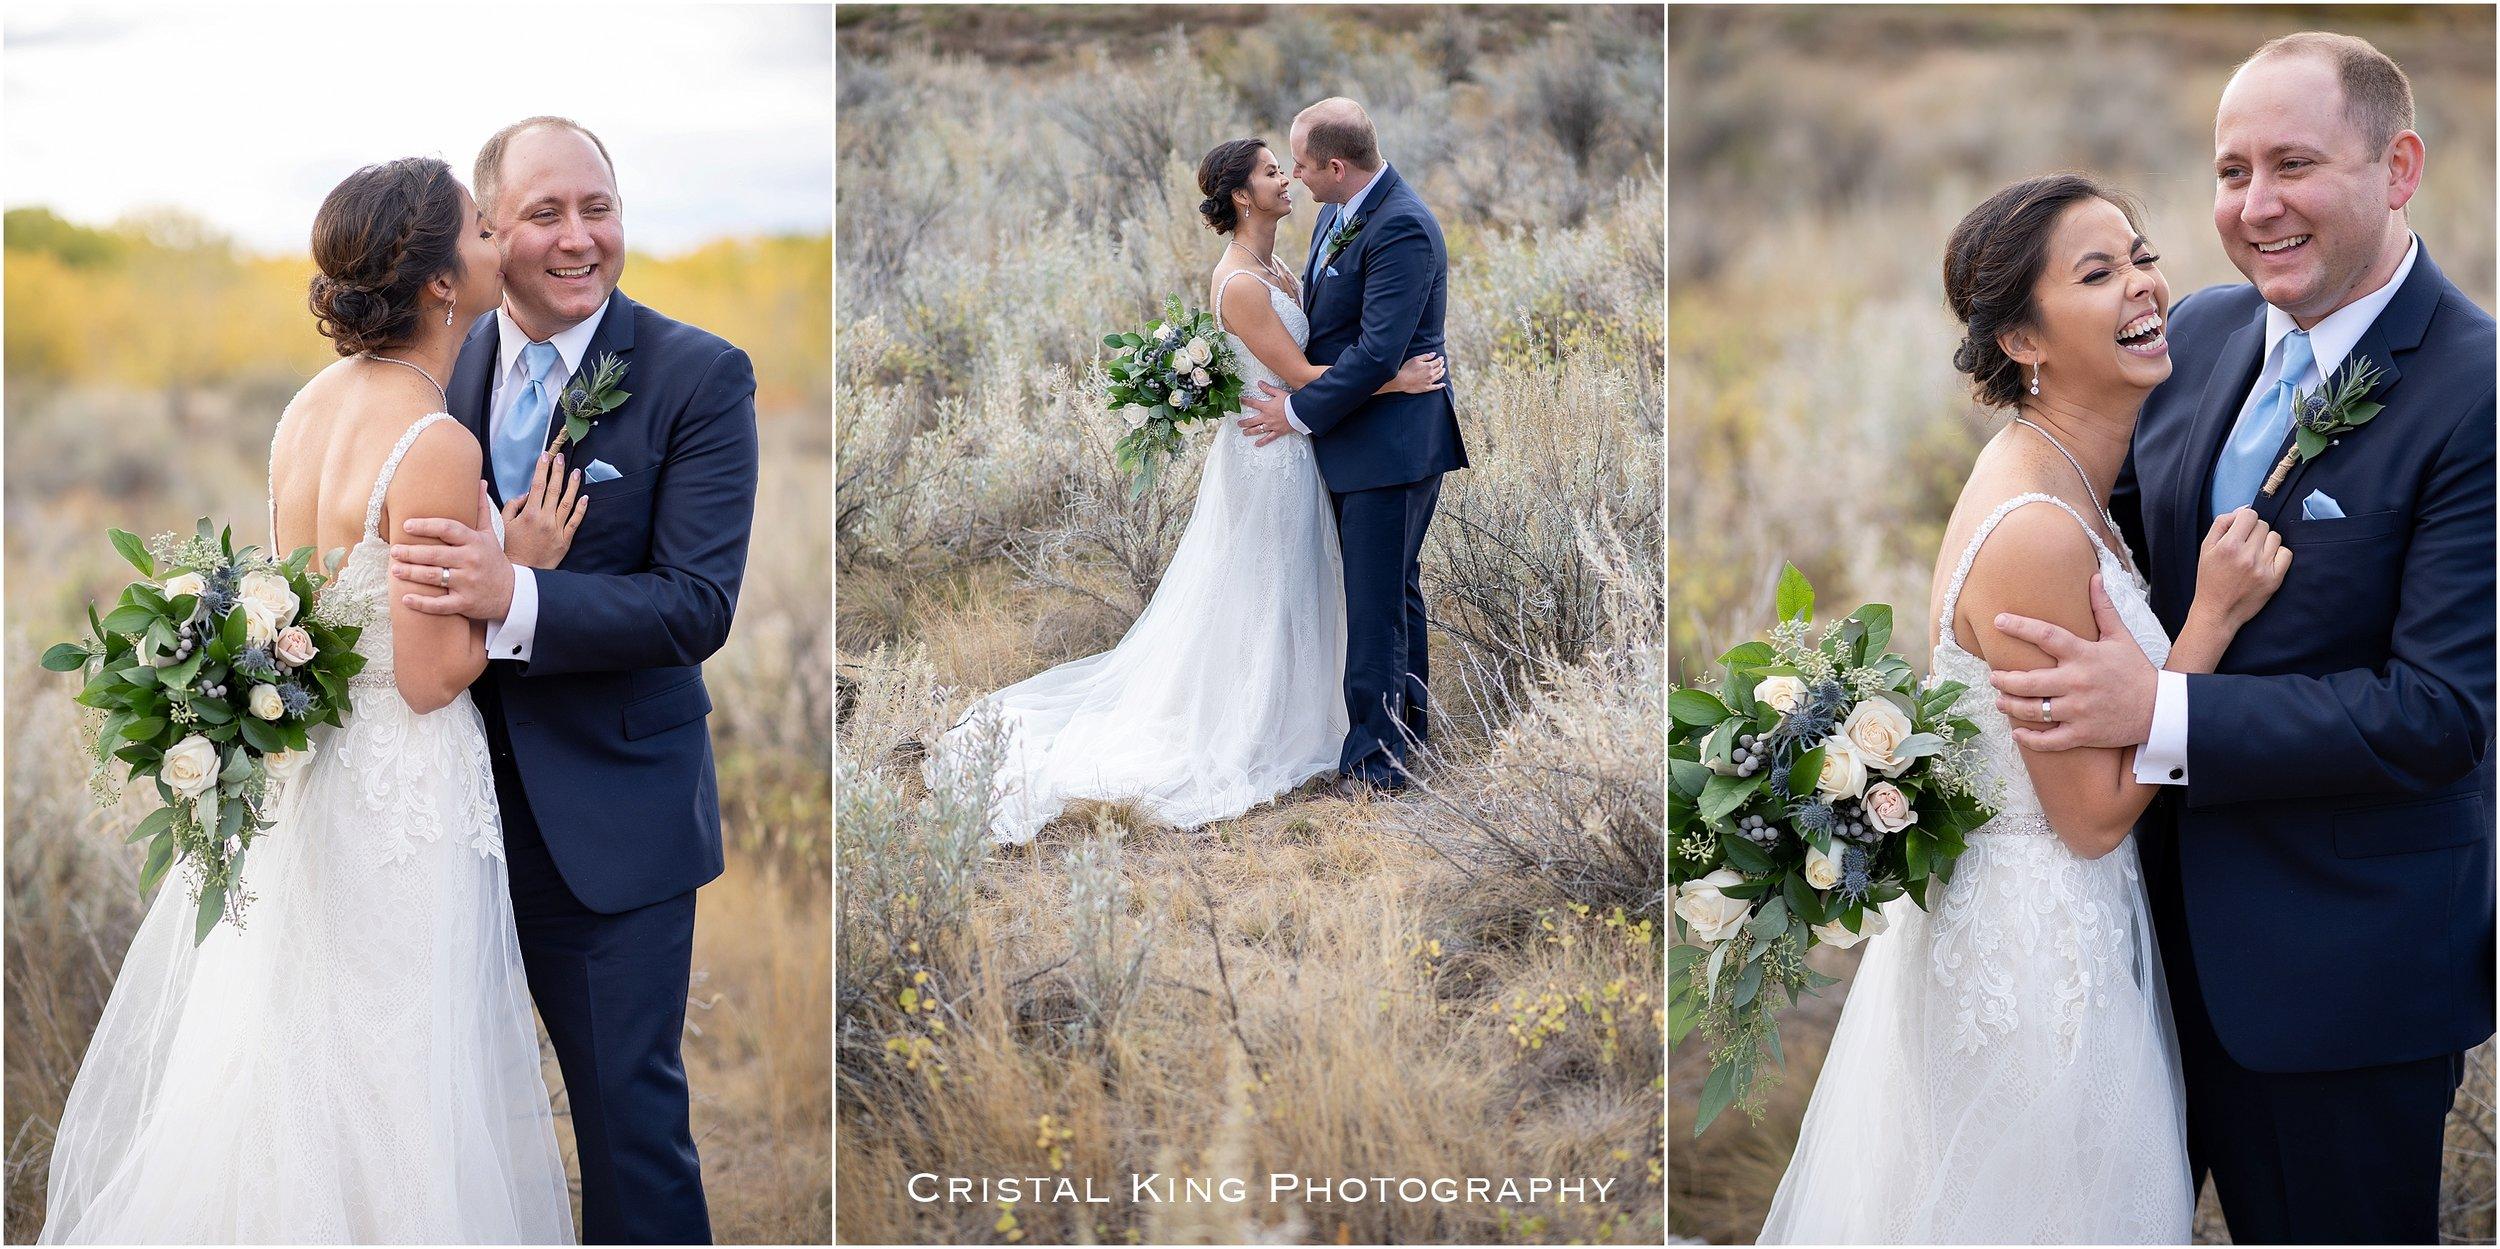 Quynh-Scotts-Wedding-77.jpg